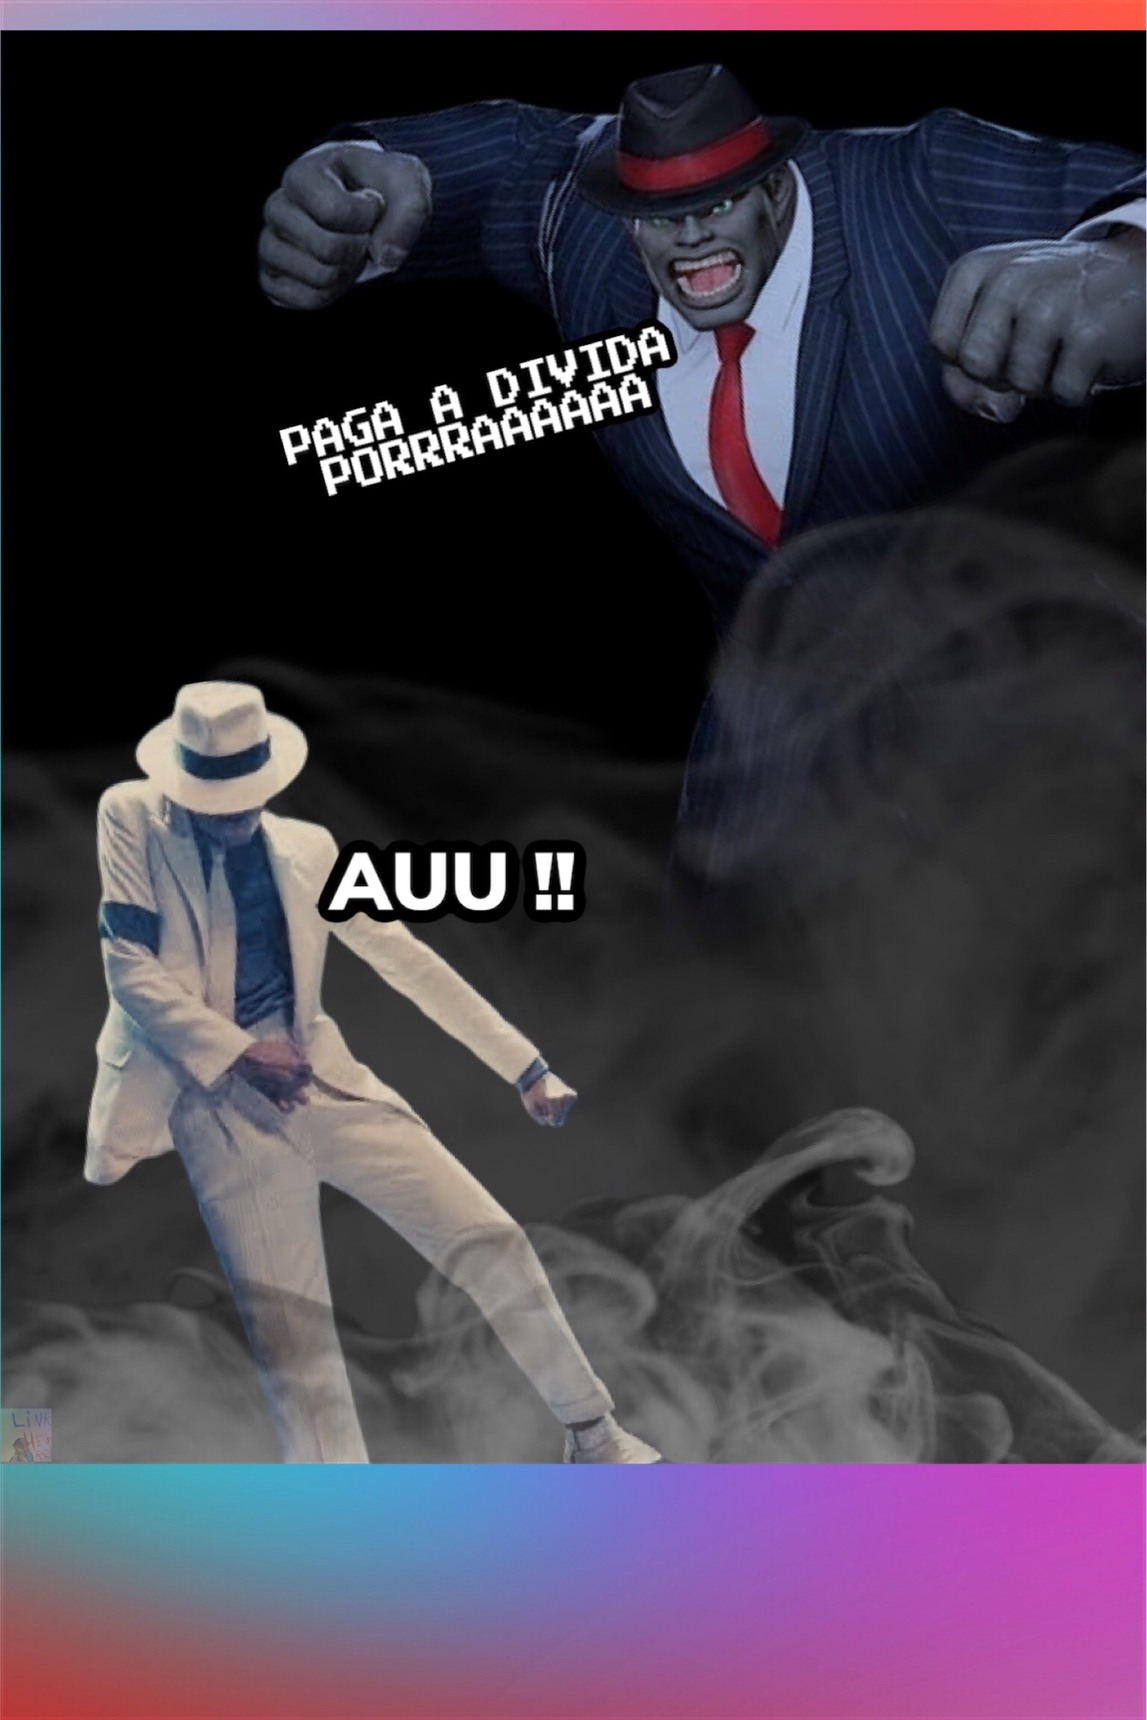 Sena Lemdariaarkkj - meme